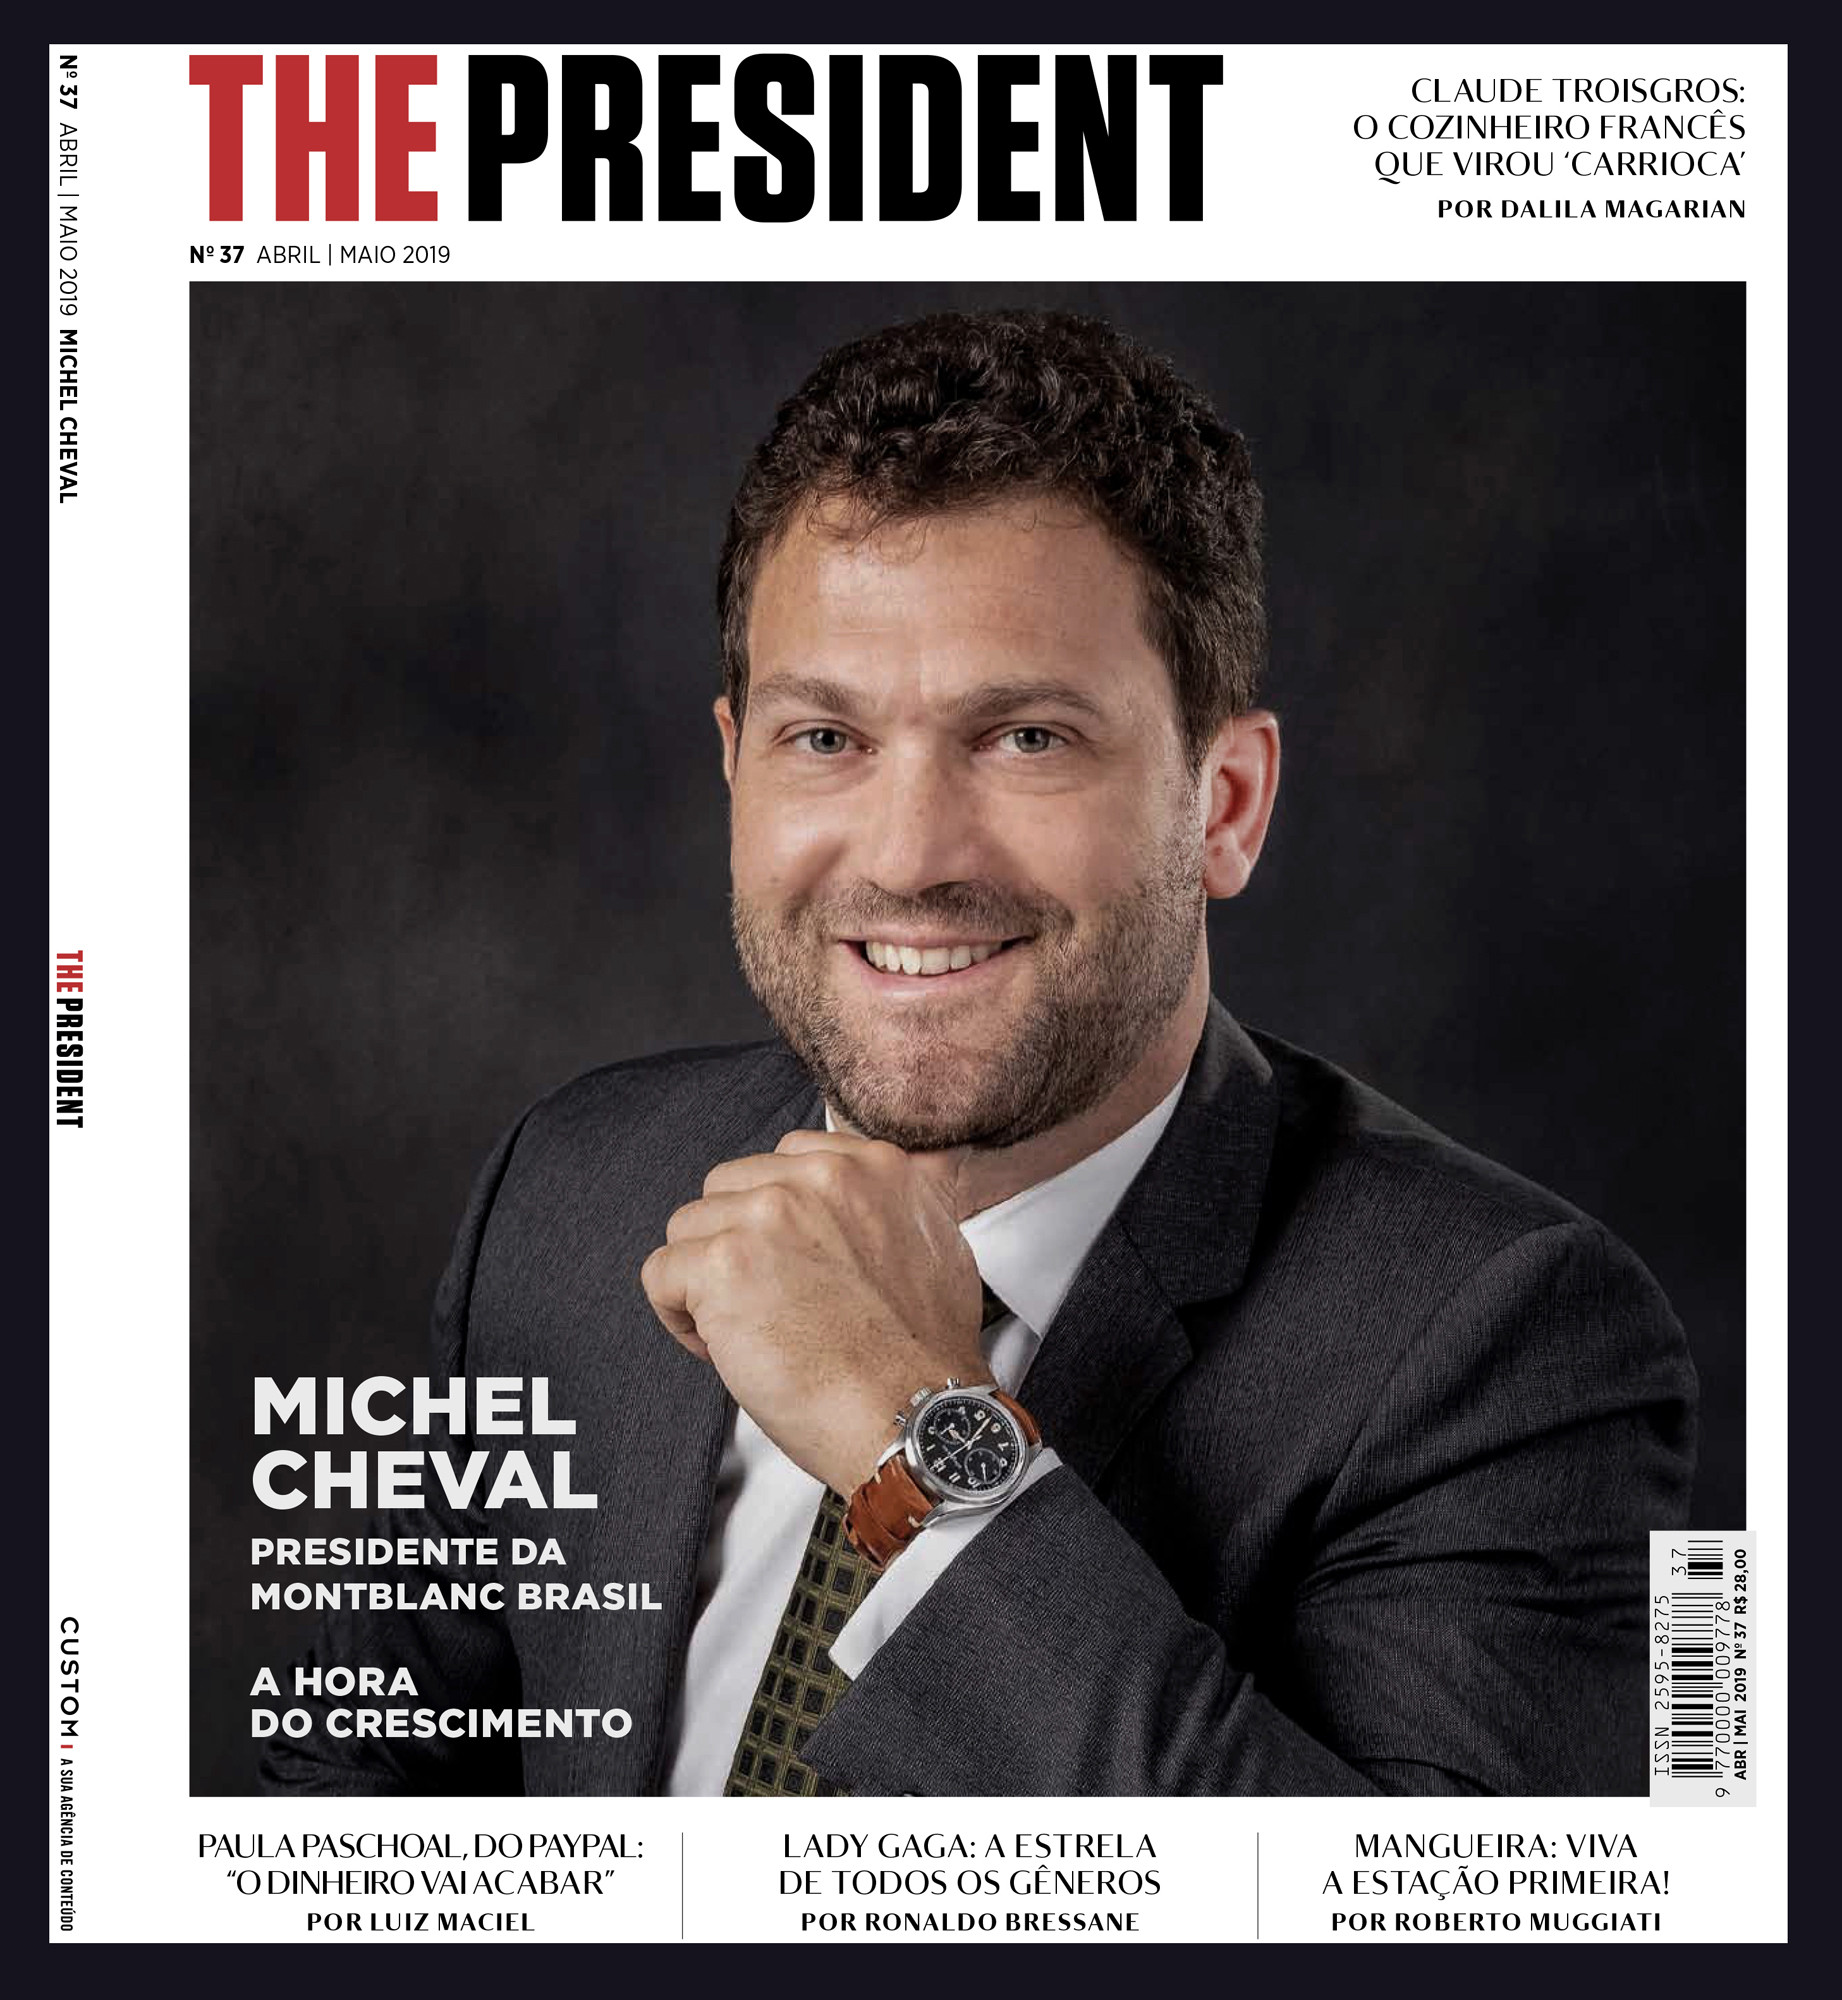 Editorial portrait of Michel Cheval